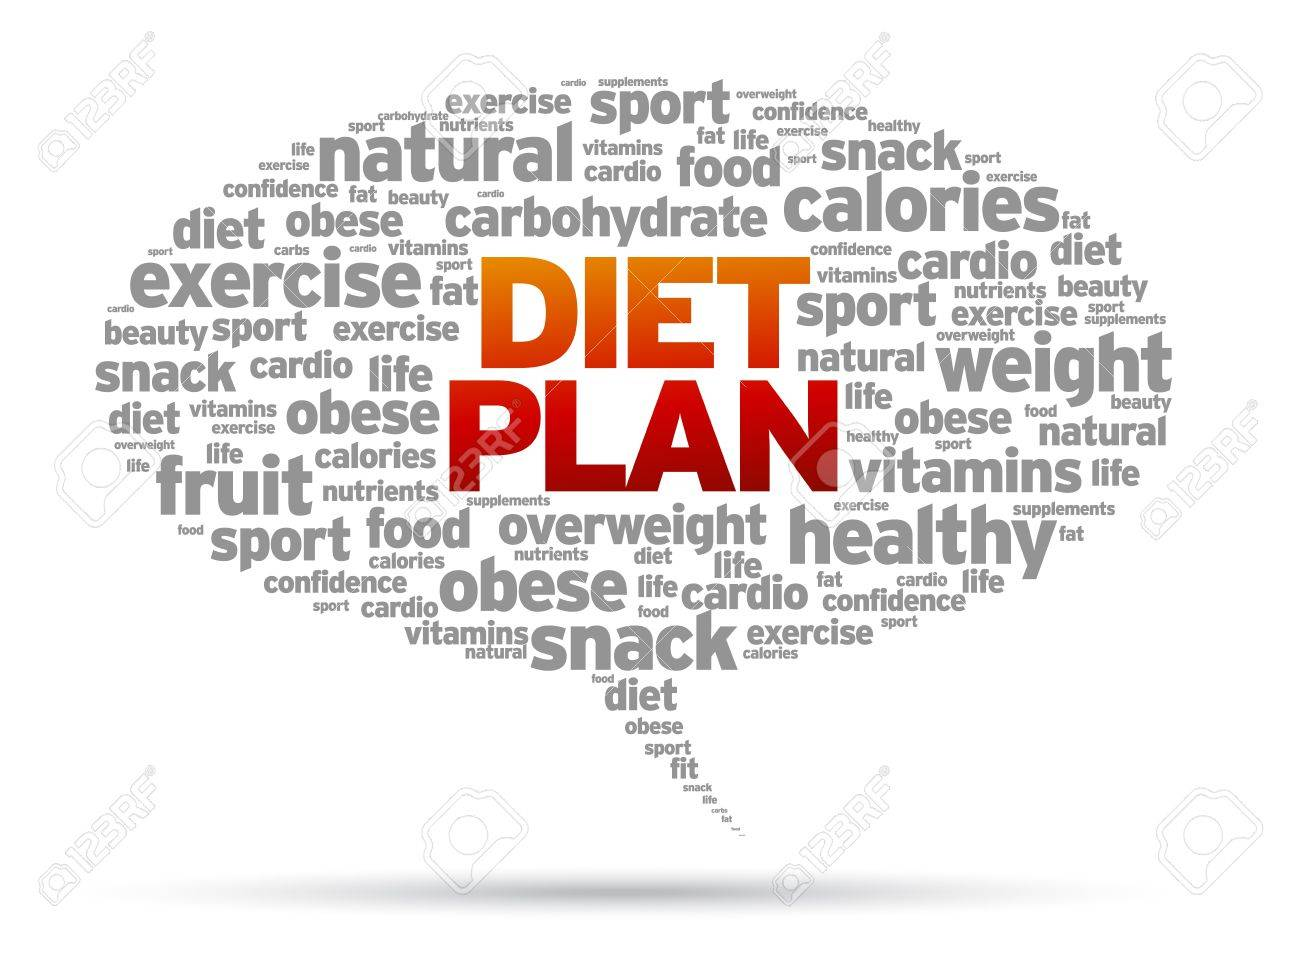 Diet Plan word speech bubble illustration on white background. - 14841140